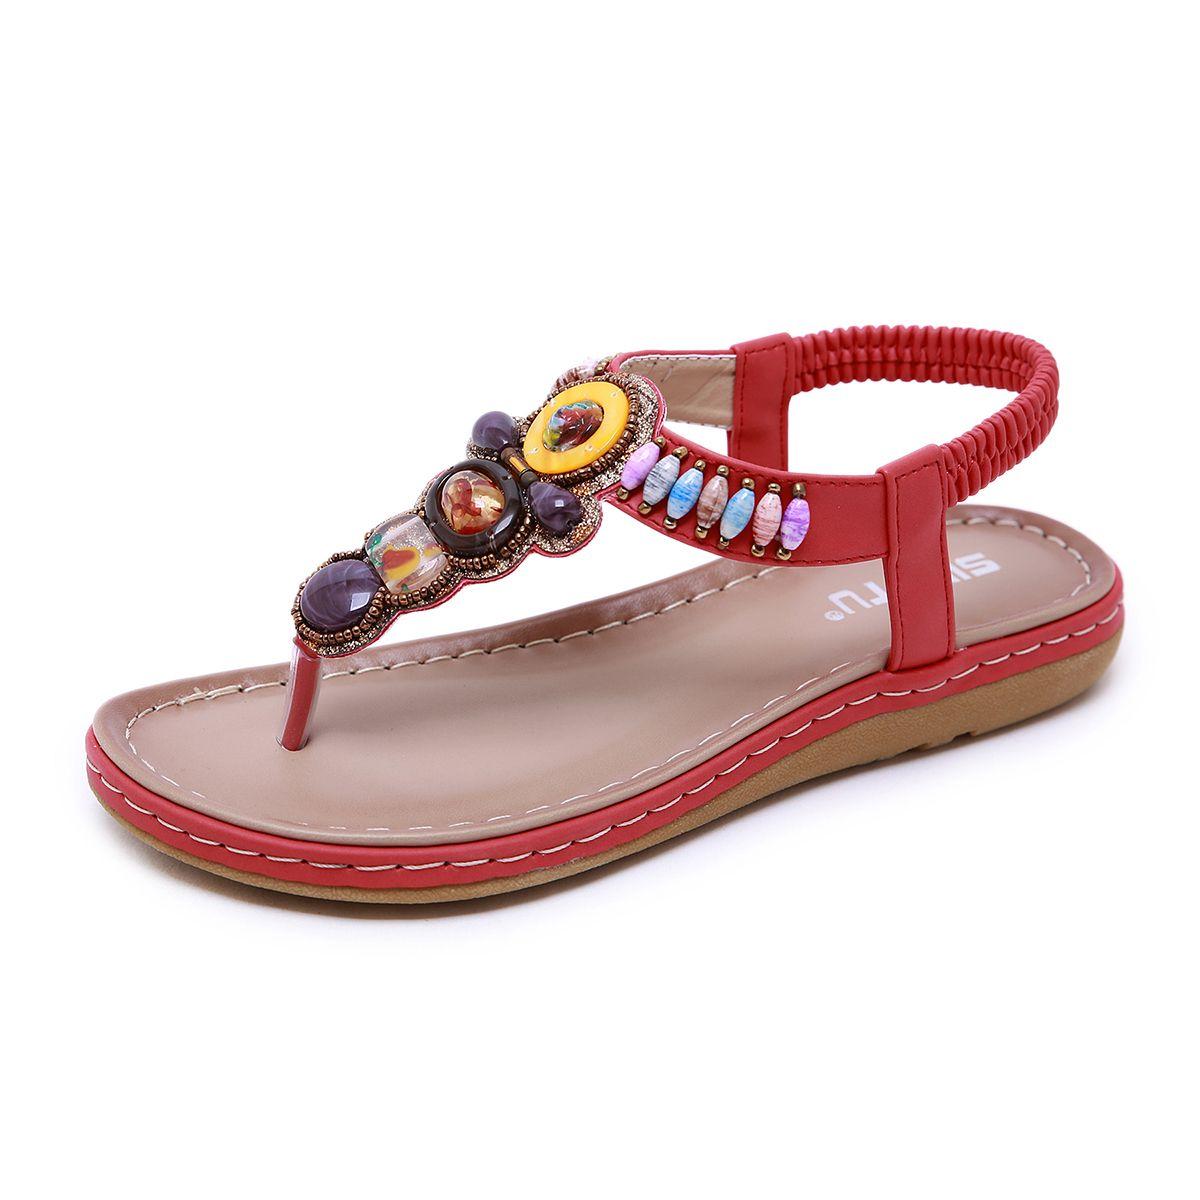 538c77ebd5f Gladiator Sandals For Ladies Bohemia Beaded Thong Sandal Women ...